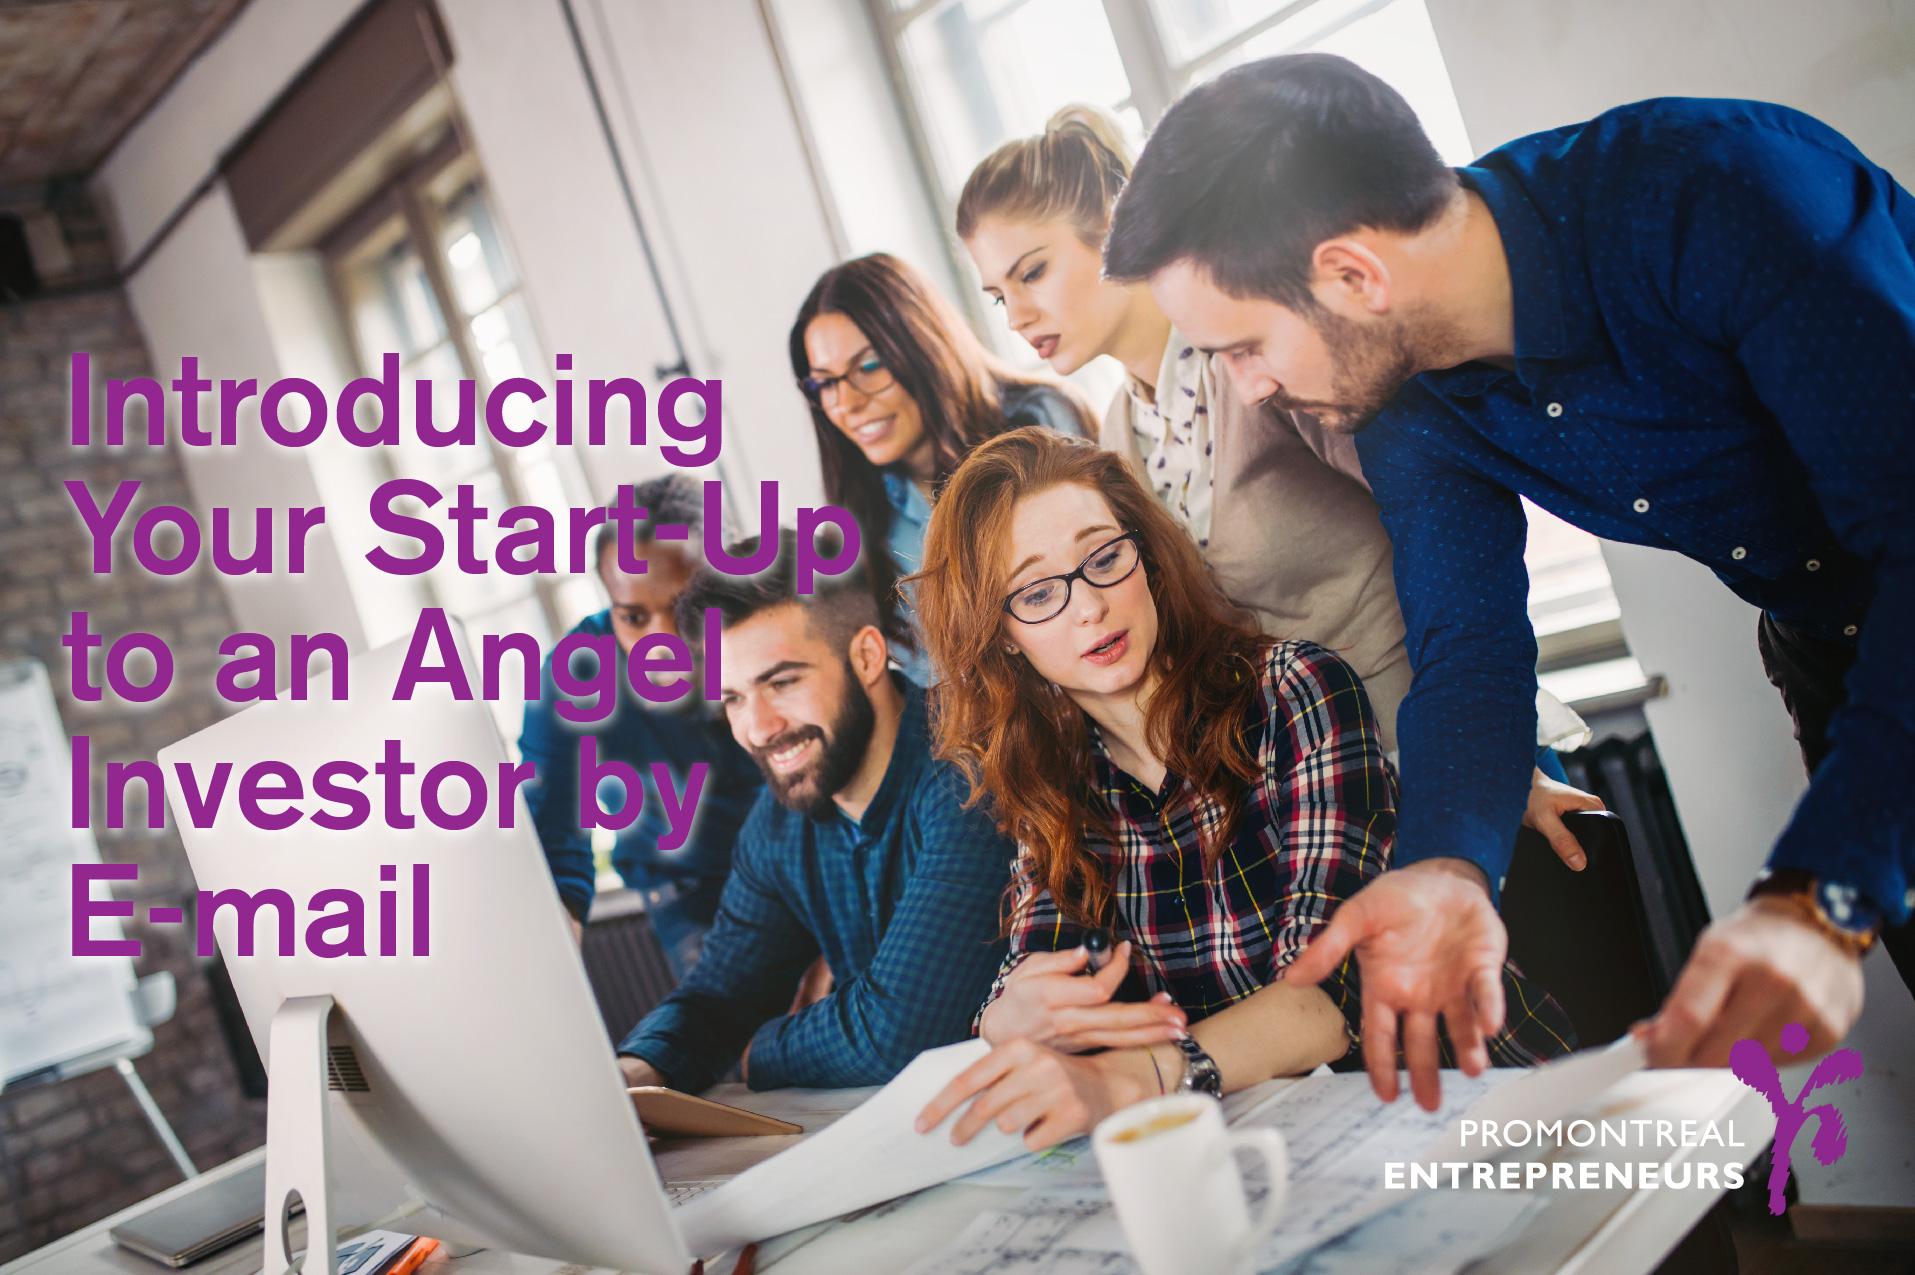 Angel investor, start-up